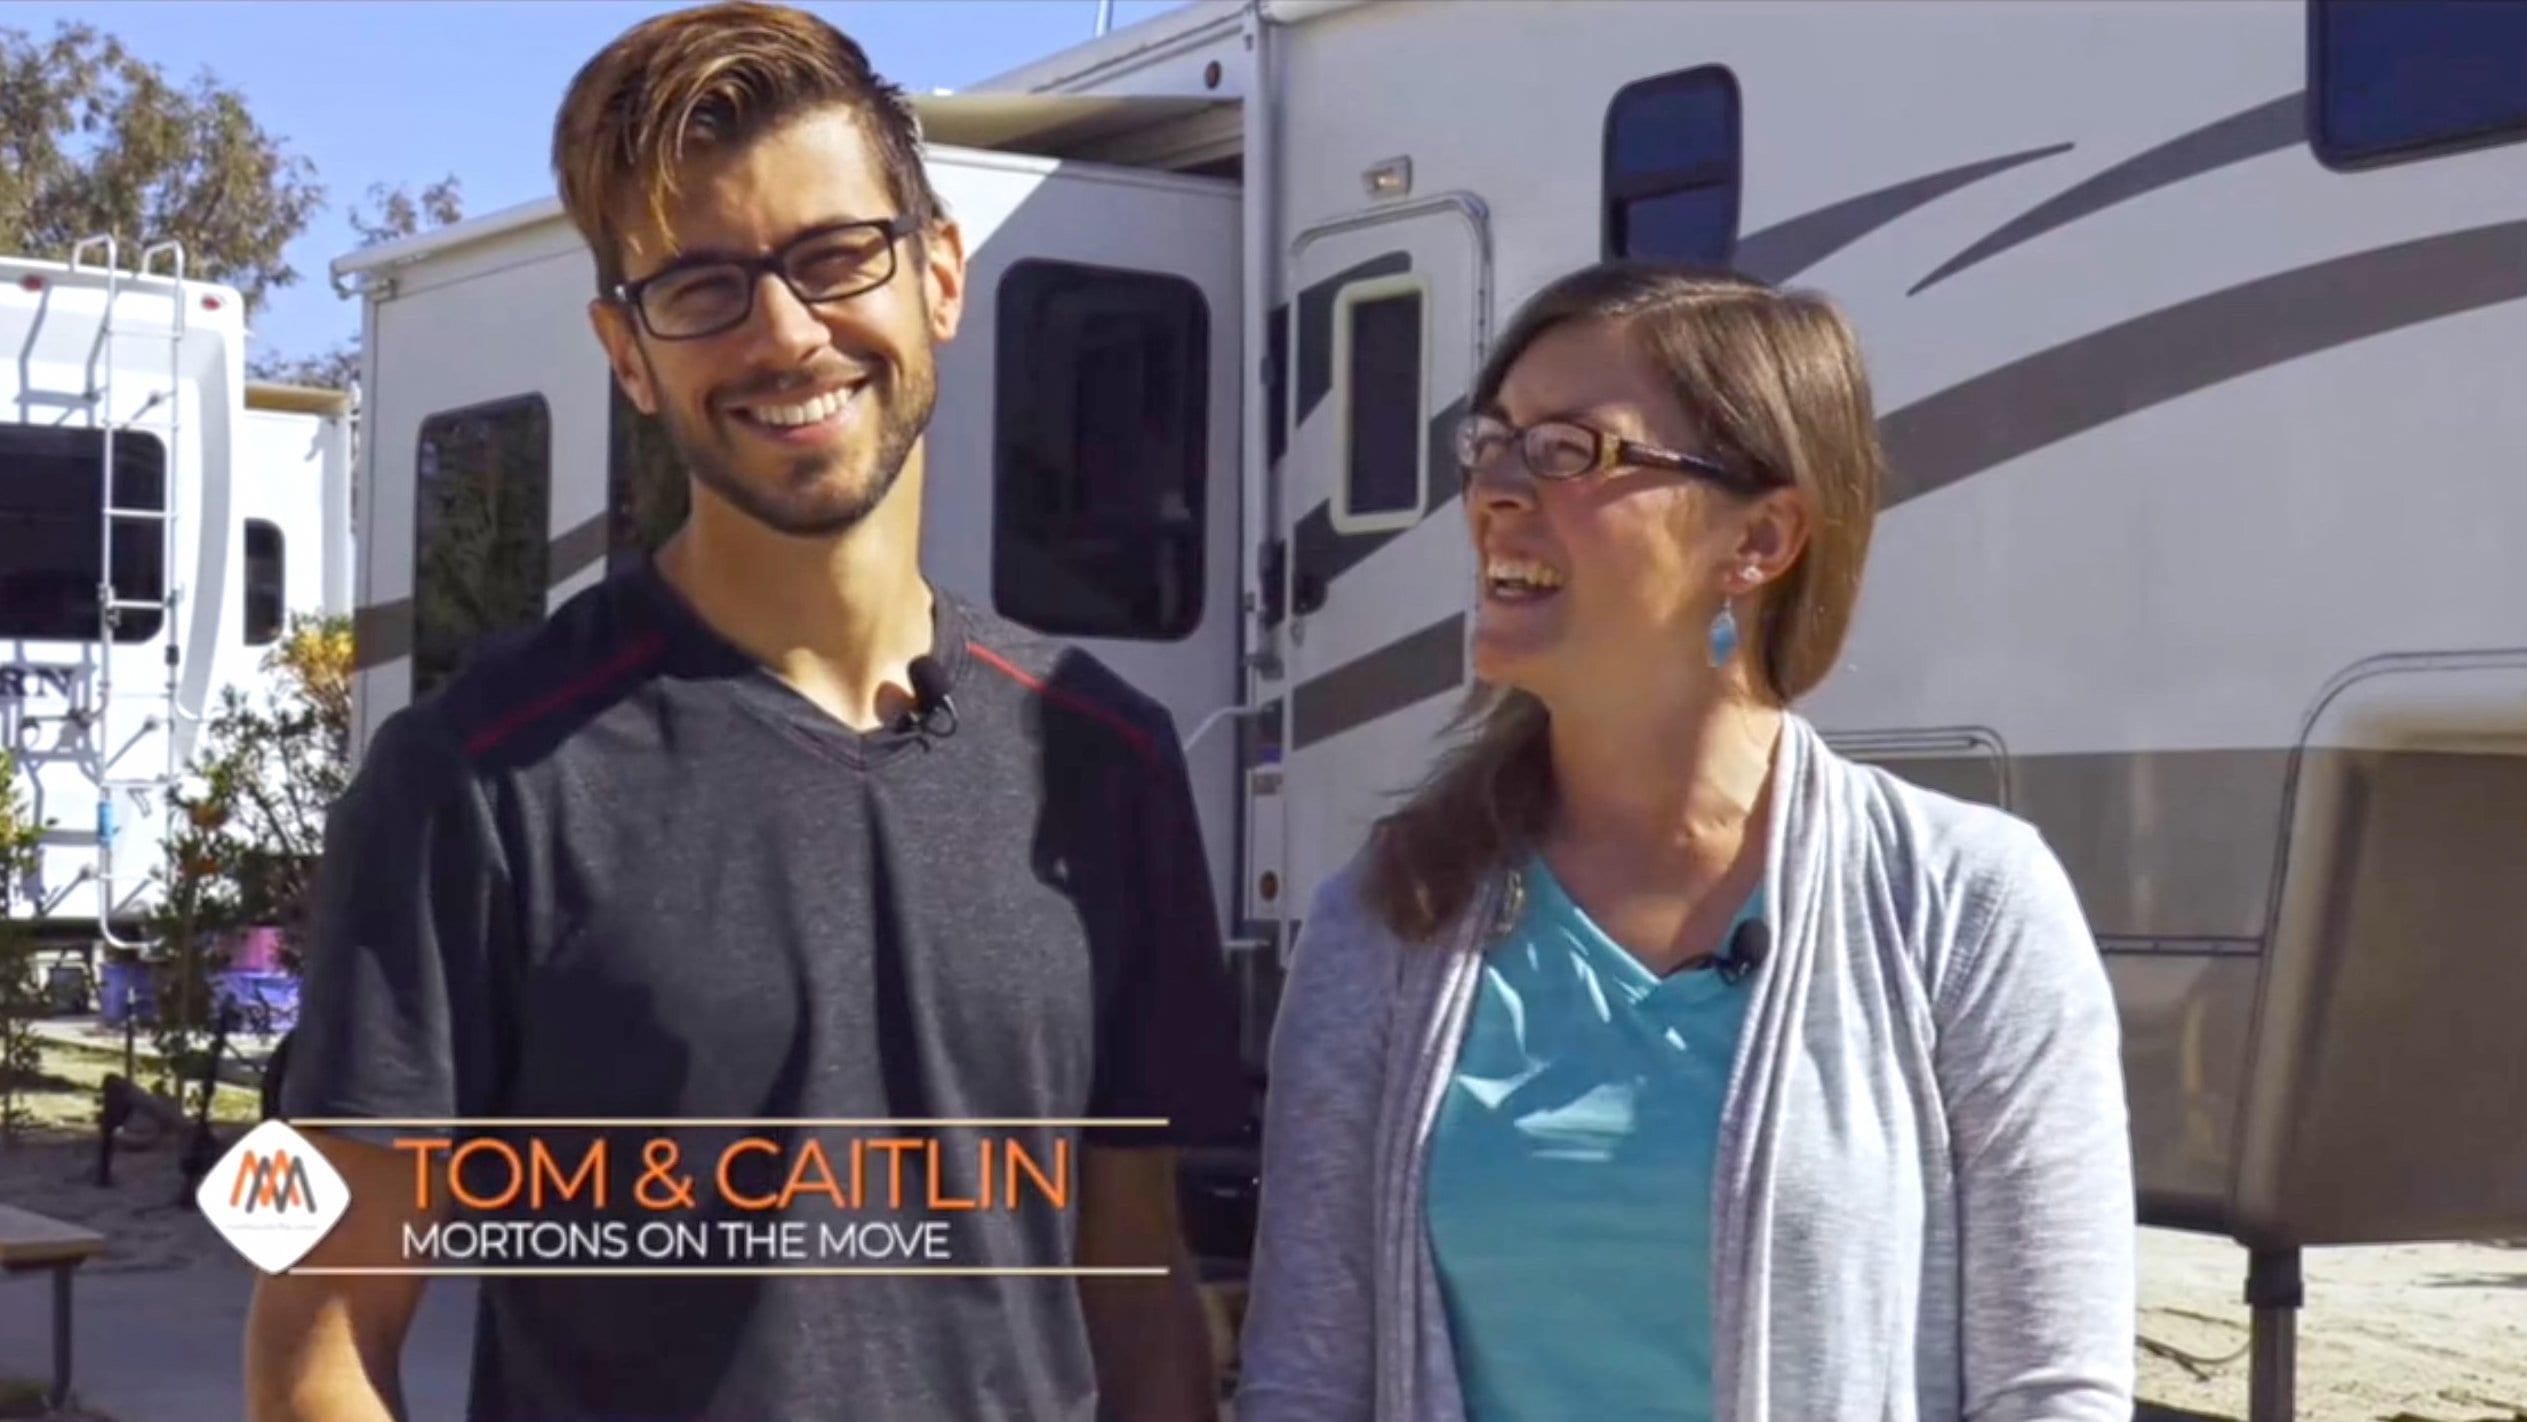 The RVers Season 2 - Tom and Cait Morton